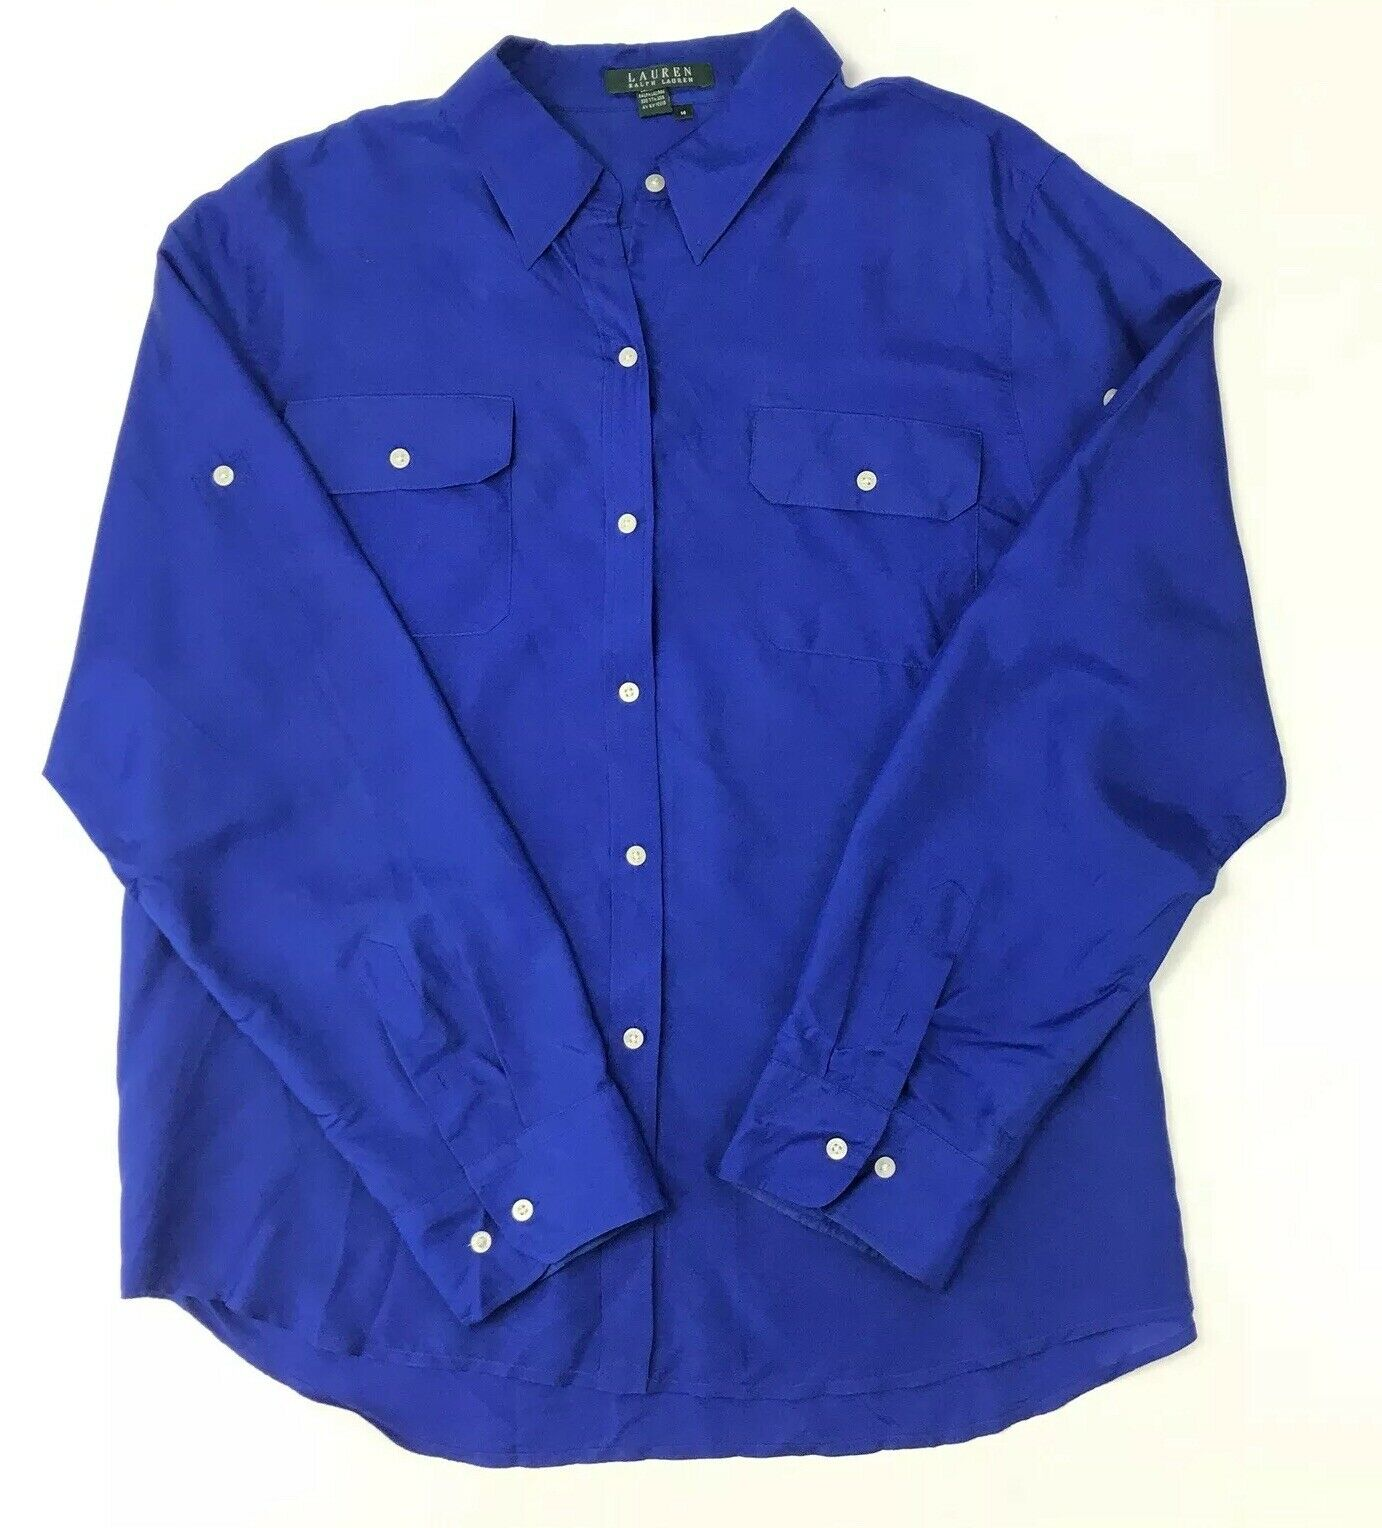 Lauren Ralph Lauren Woherren 100% Silk Cobalt Blau Button Up Blouse Größe 14